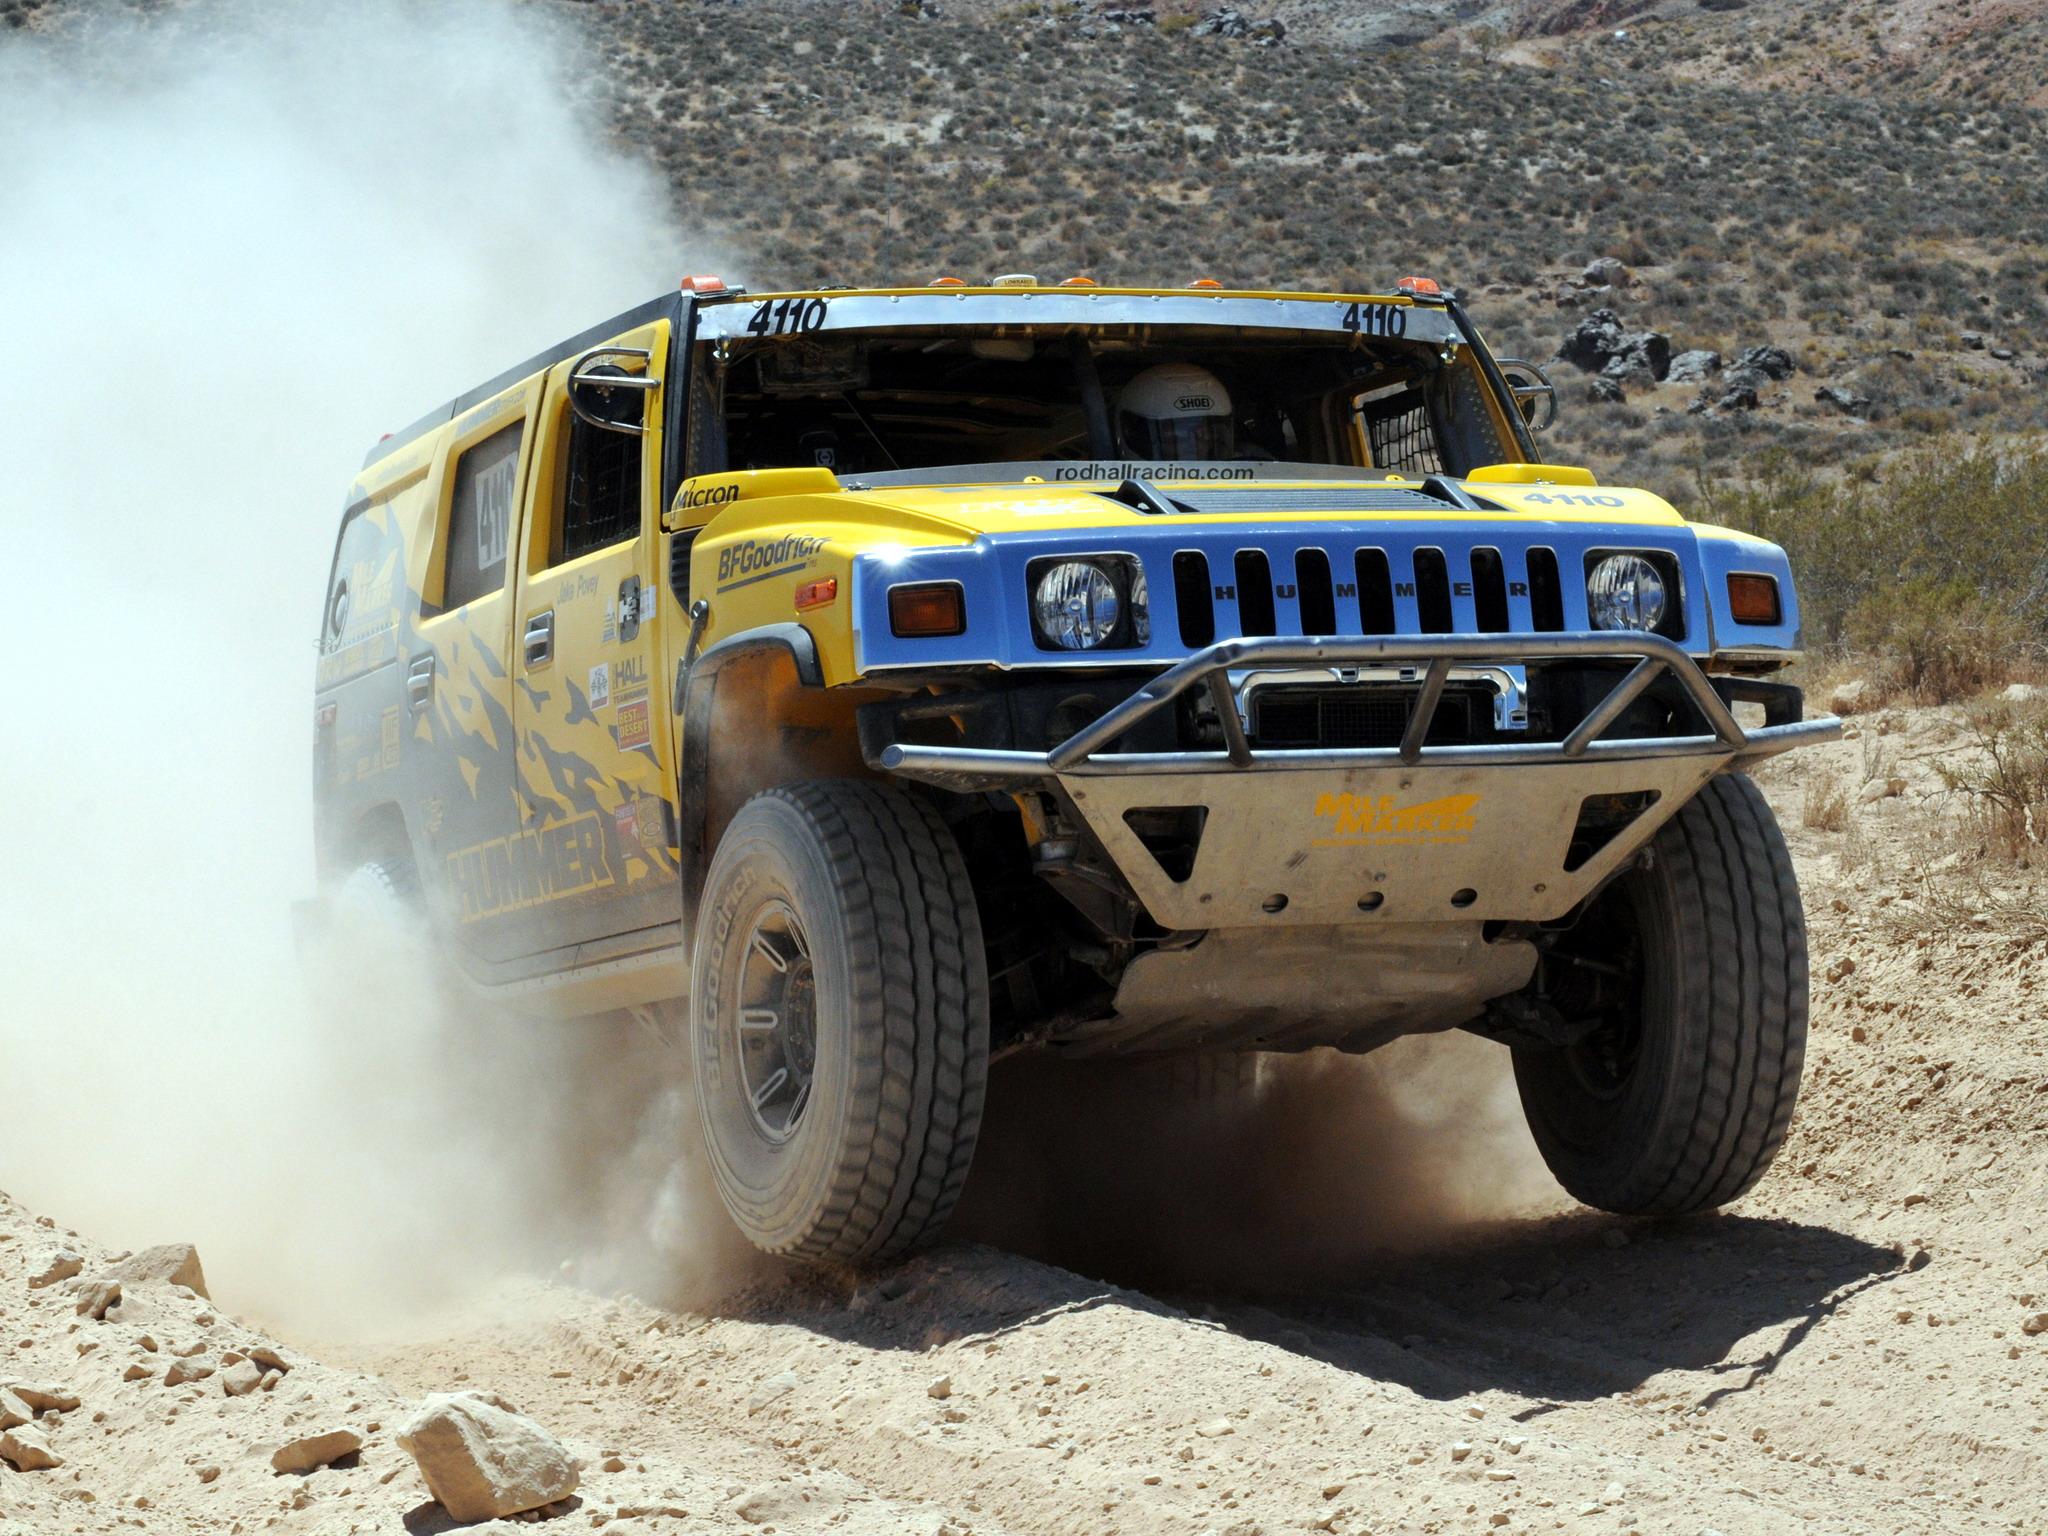 2007 Hummer H2 Race Truck Racing Offroad 4x4 Suv Wallpaper